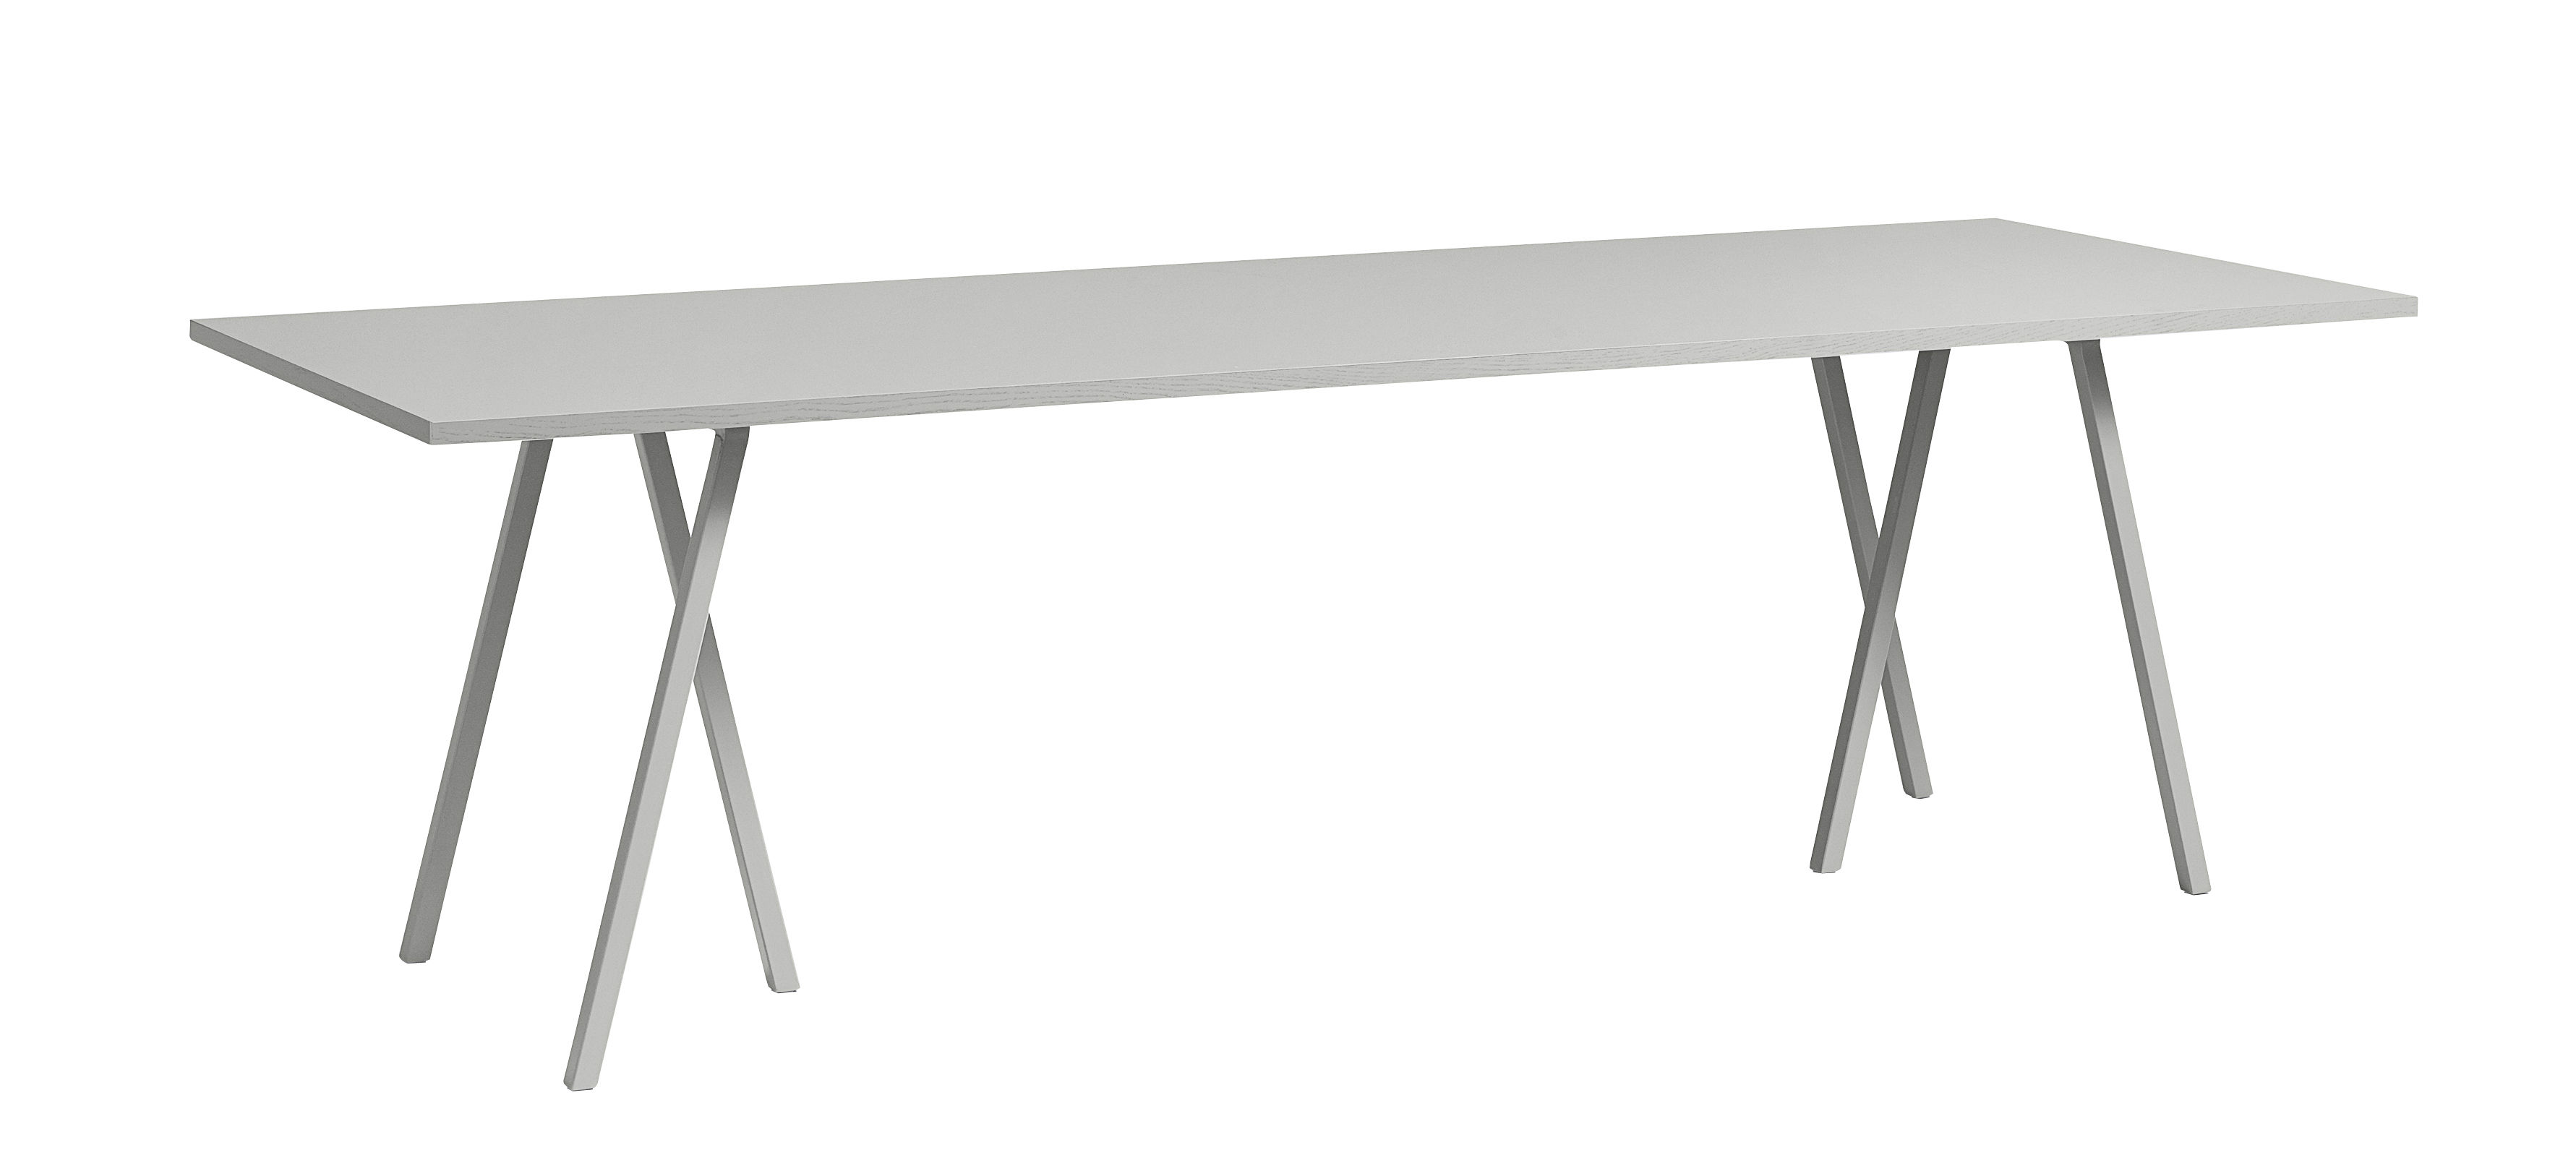 Arredamento - Tavoli - Tavolo Loop / L 180 cm - Hay - Grigio chiaro - Acciaio laccato